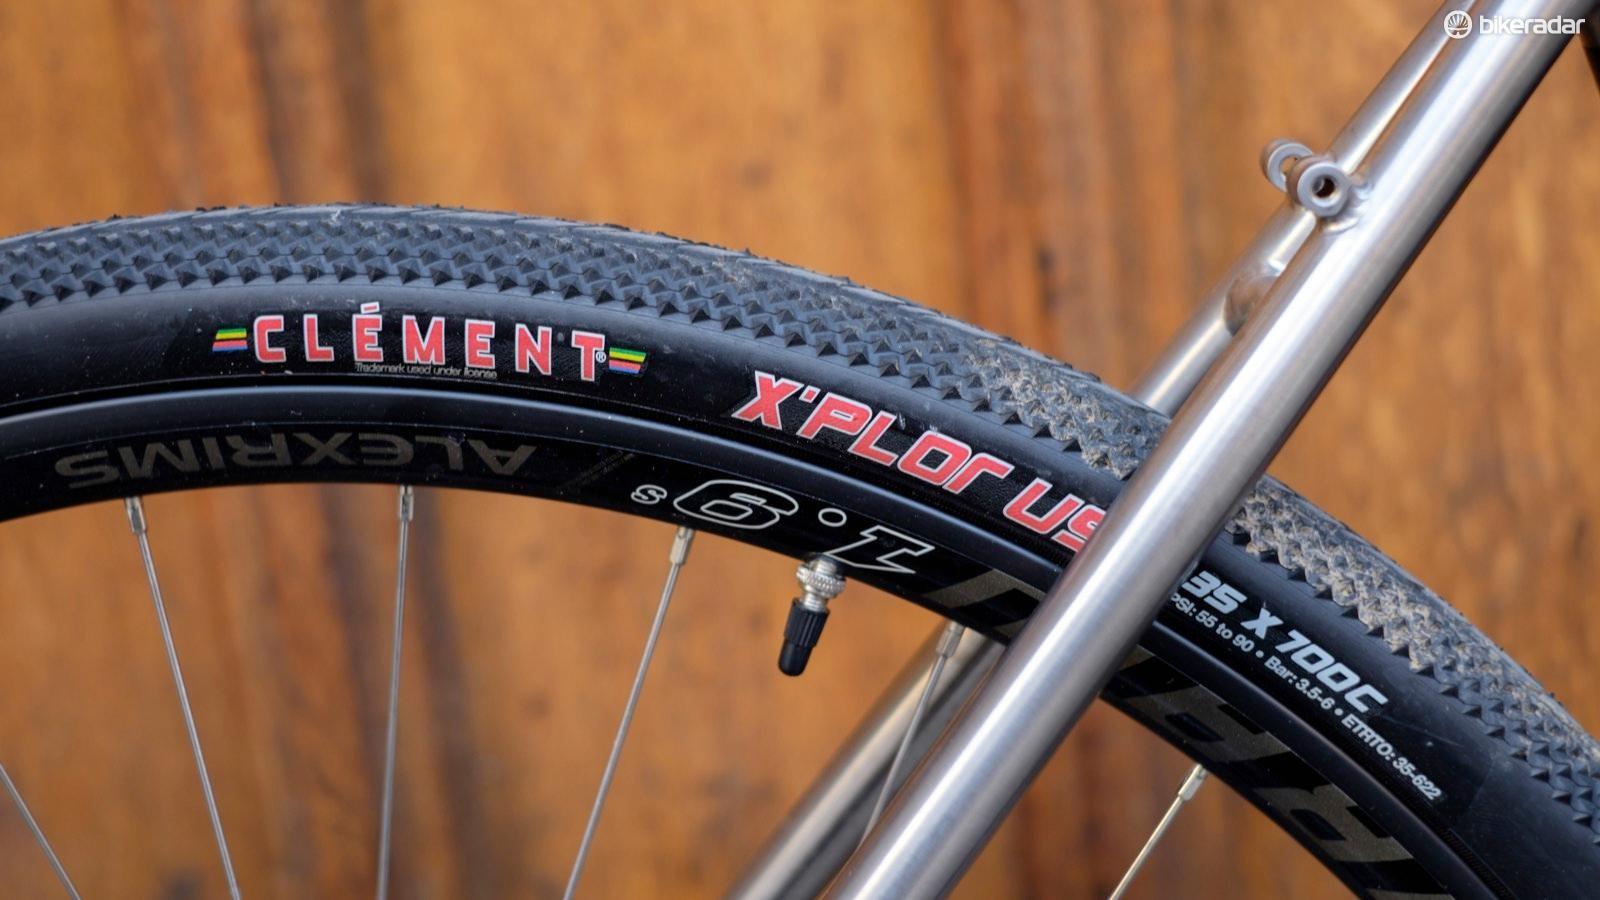 Clement X'Plor tyres in 35mm width adorn Alex Draw rims